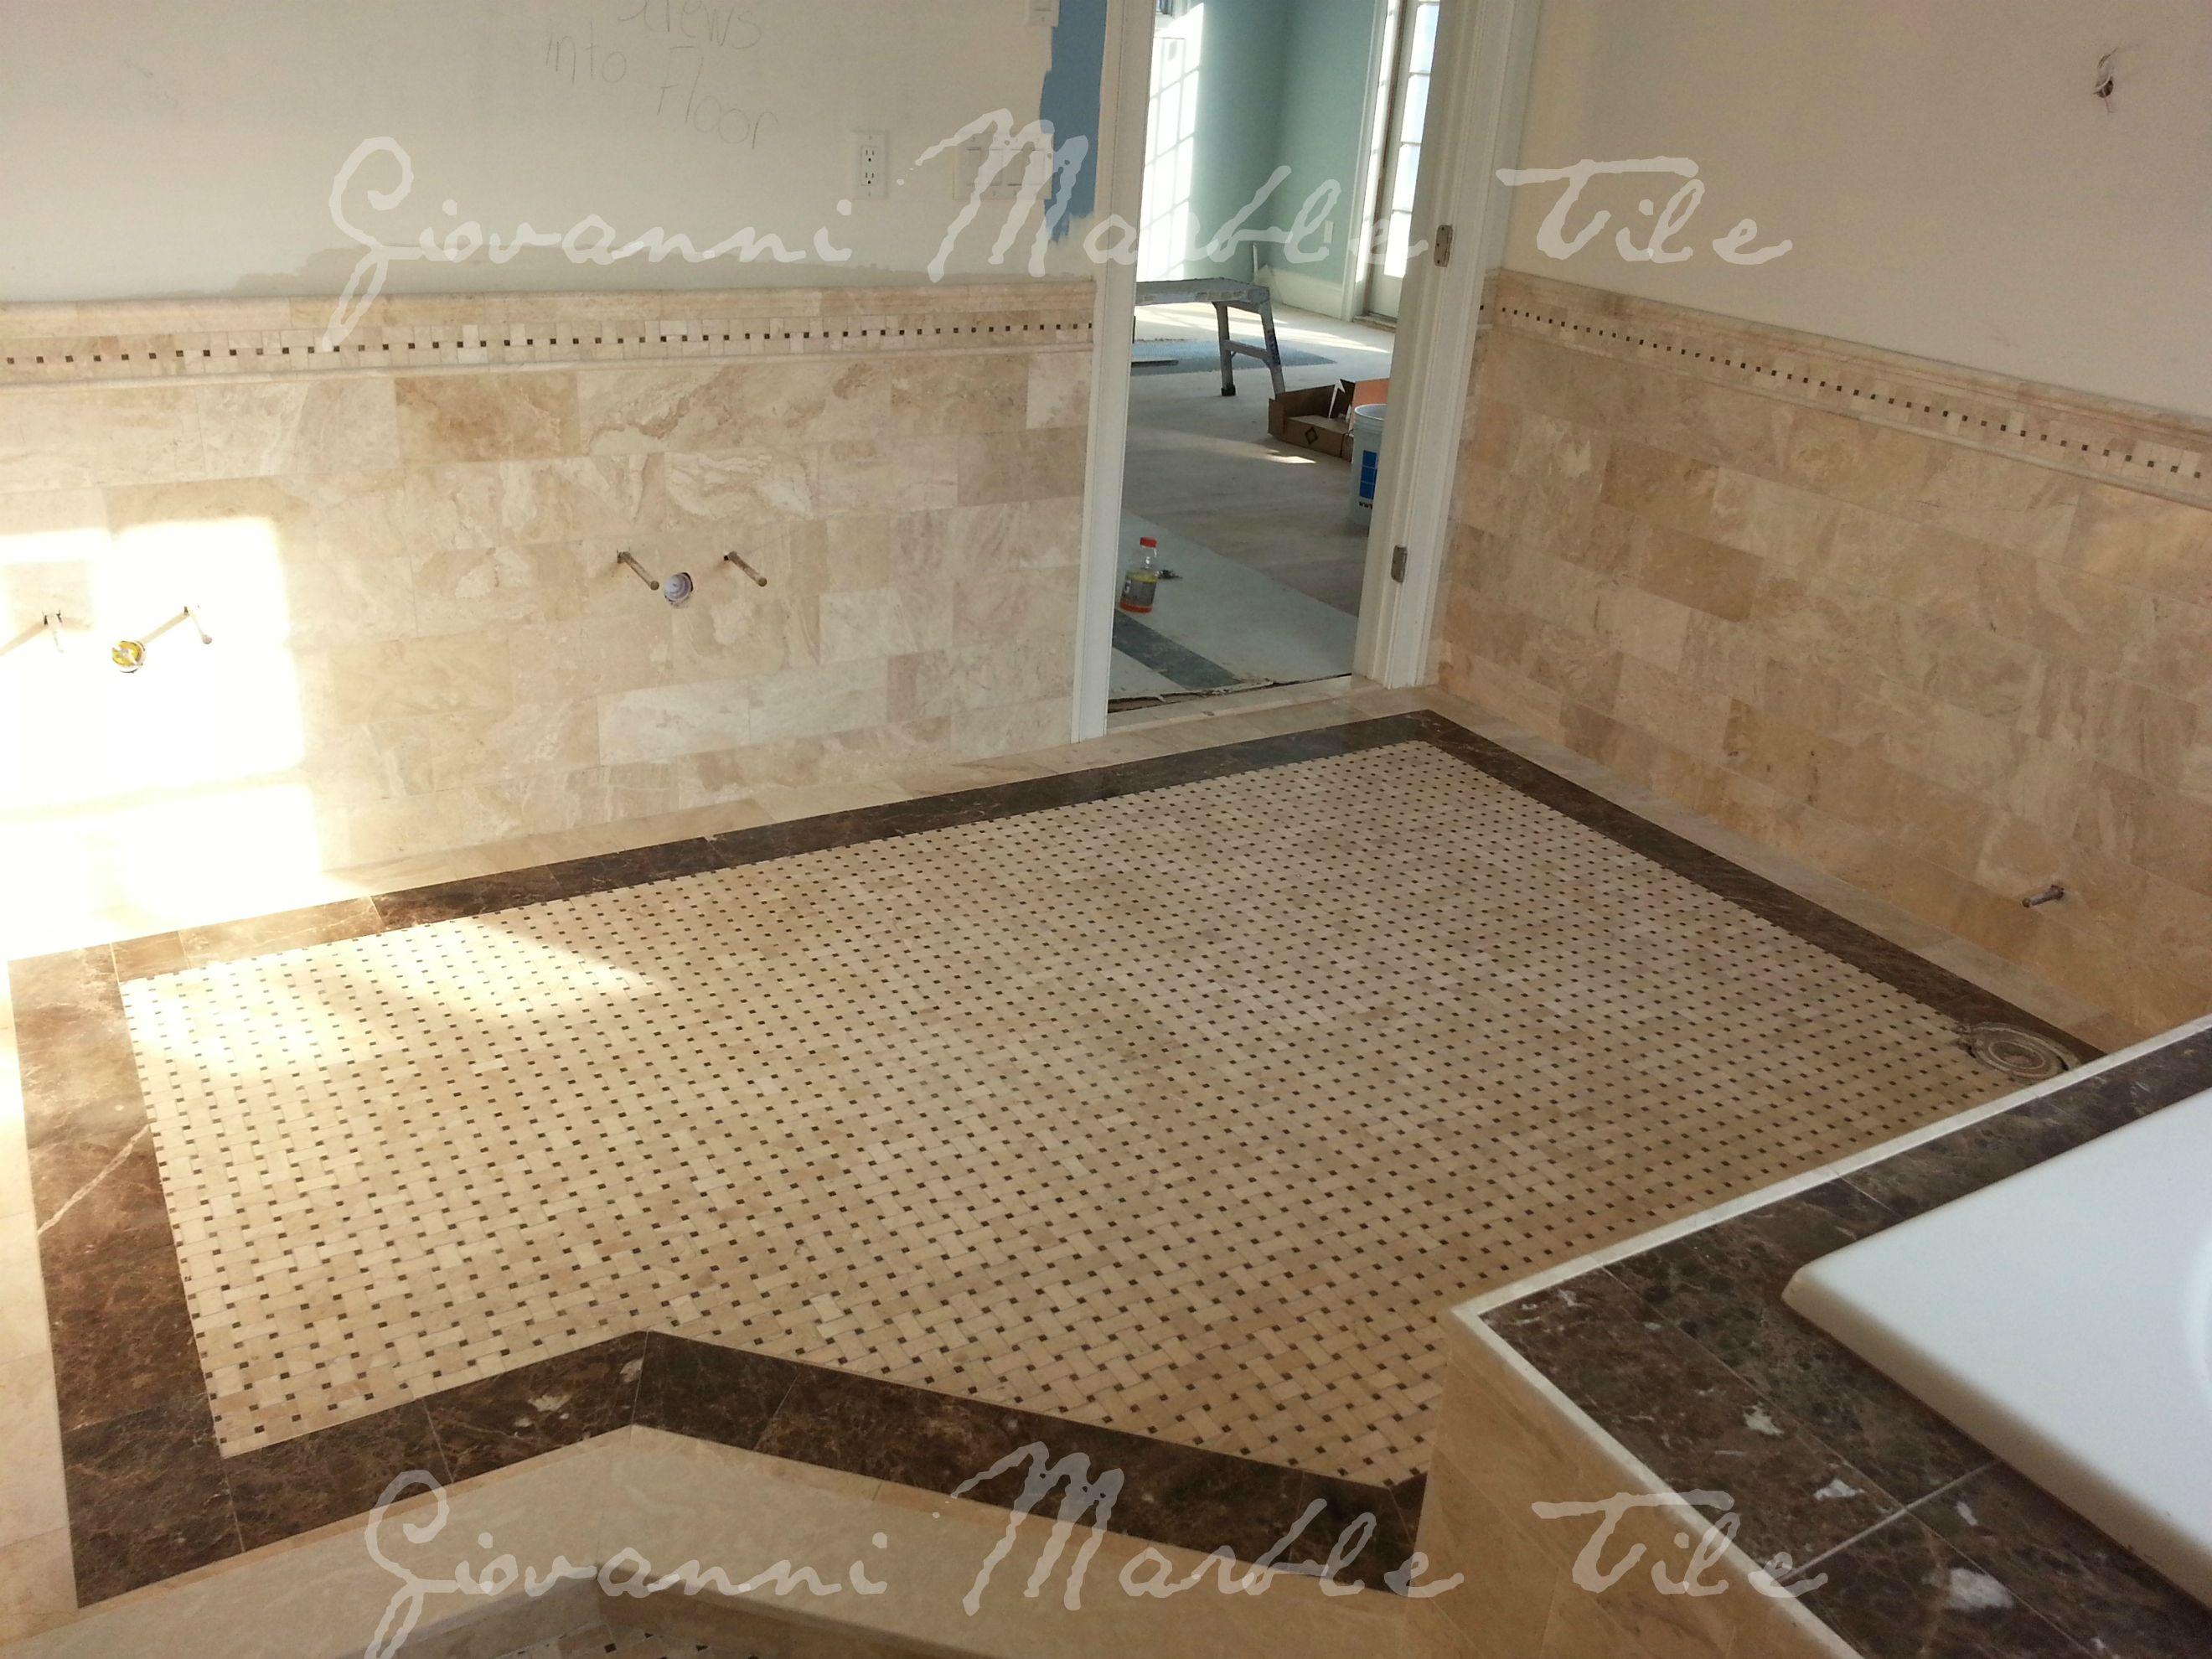 Custom Floor Inlay With Crema Marfil Brown Emperador Marble With Basket Weave Mosaic Inset Custom Tiles Unique Flooring Custom Floor